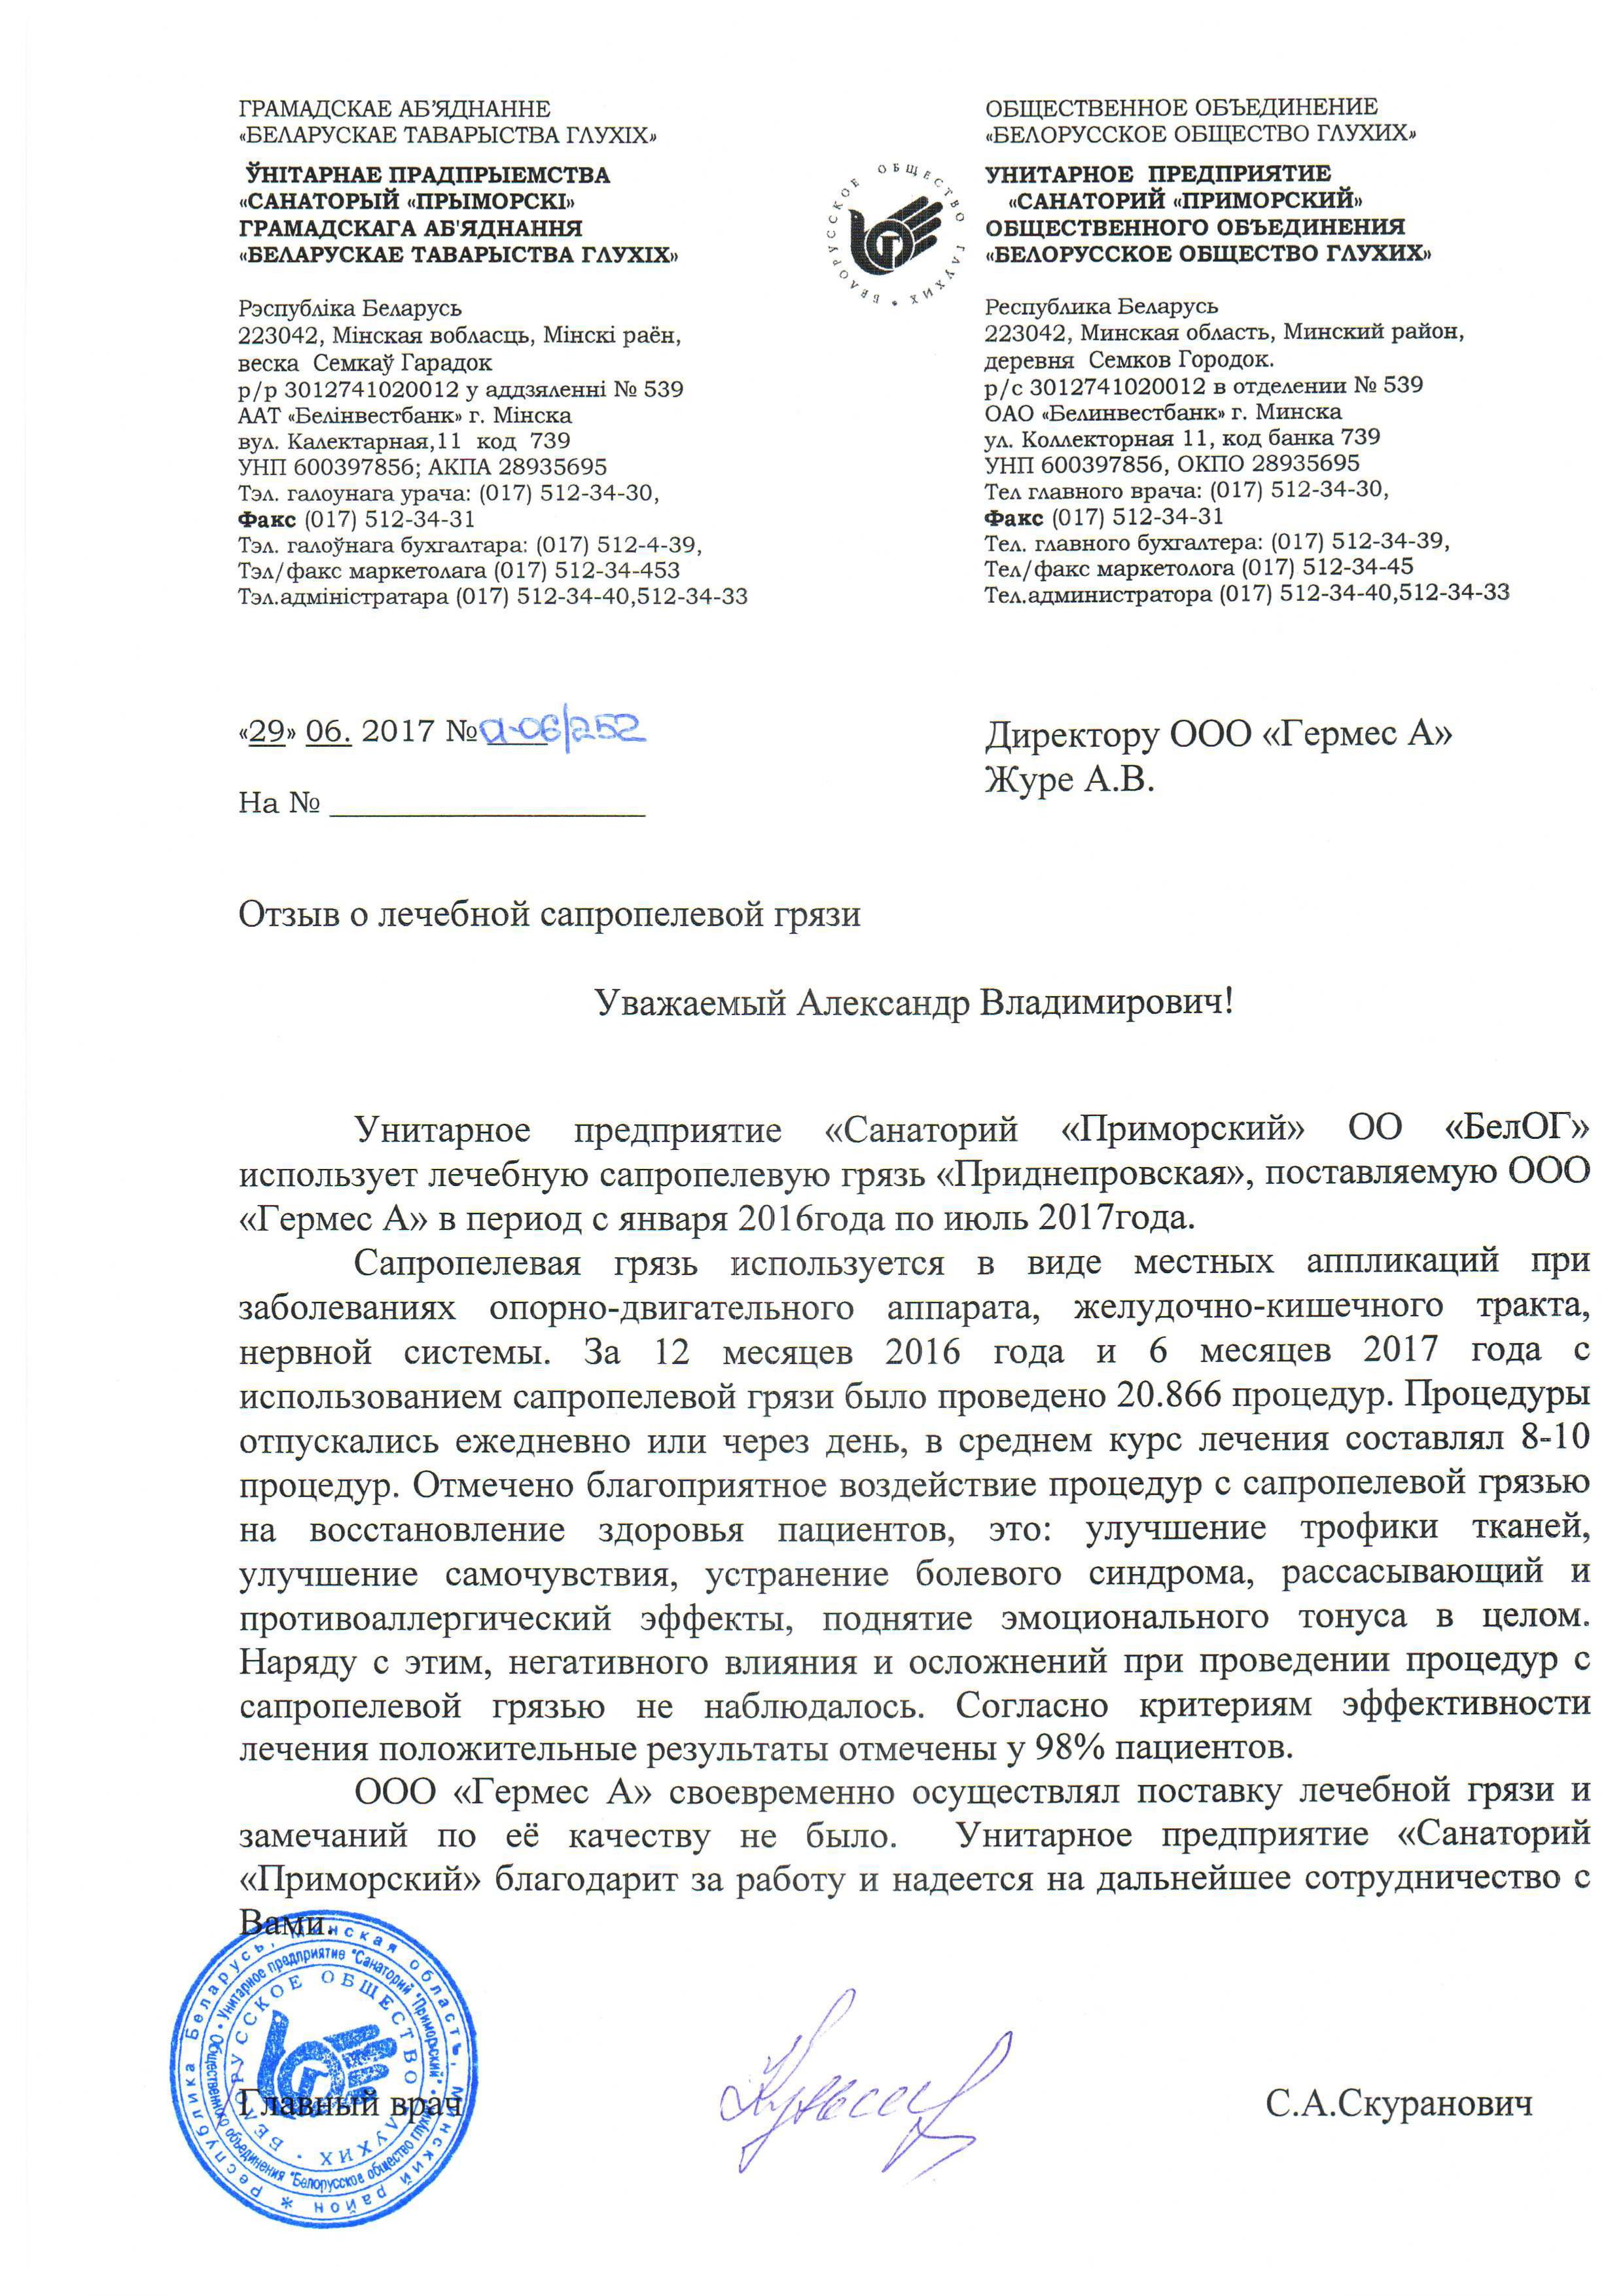 Отзыв Санаторий Приморский